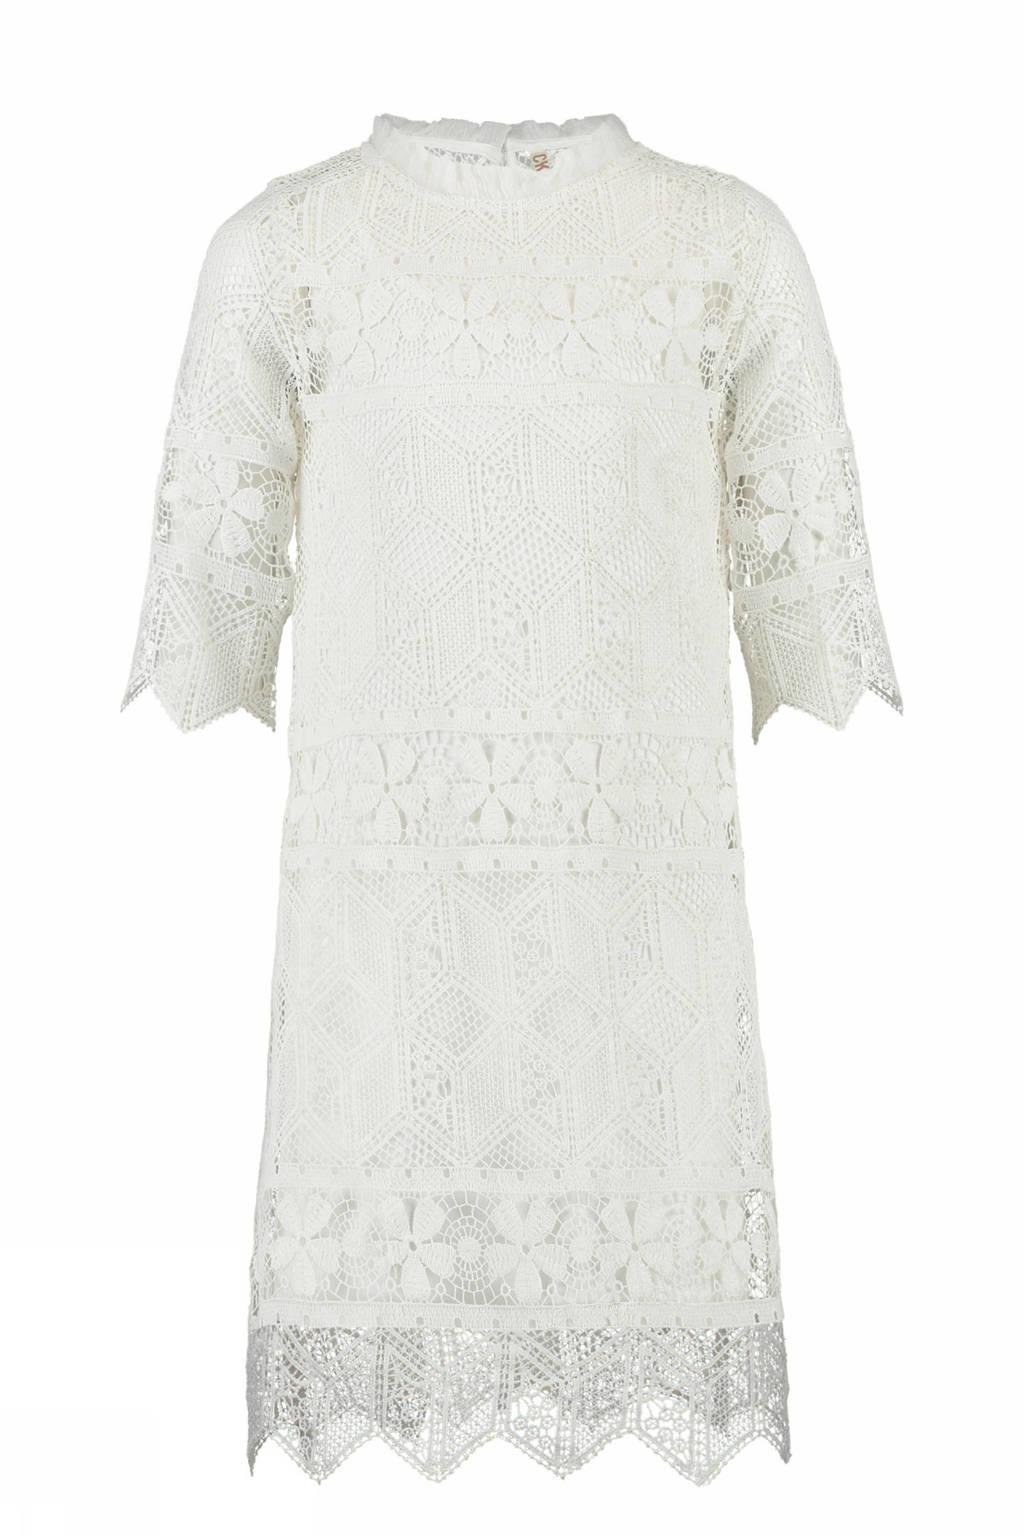 CKS KIDS kanten jurk Gaelle wit, Gebroken wit